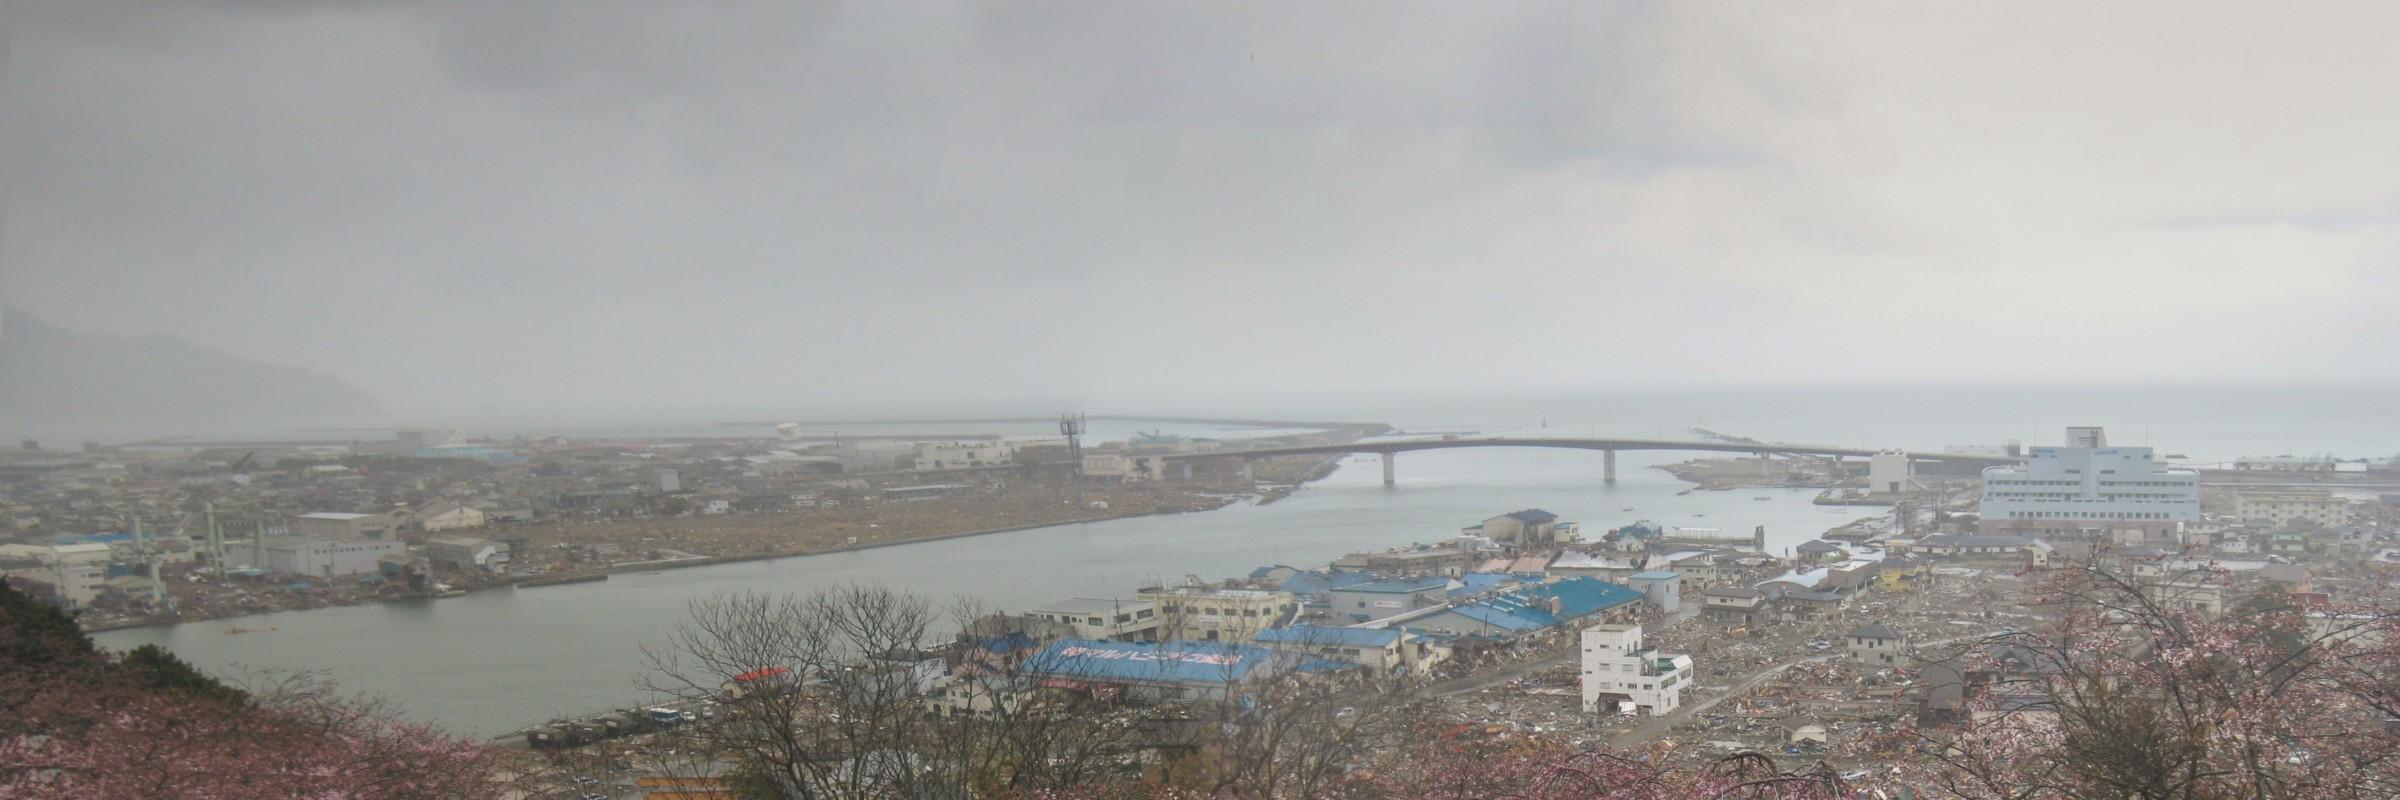 Ishinomaki lies desolated after the earthquake and tsunami of 2011